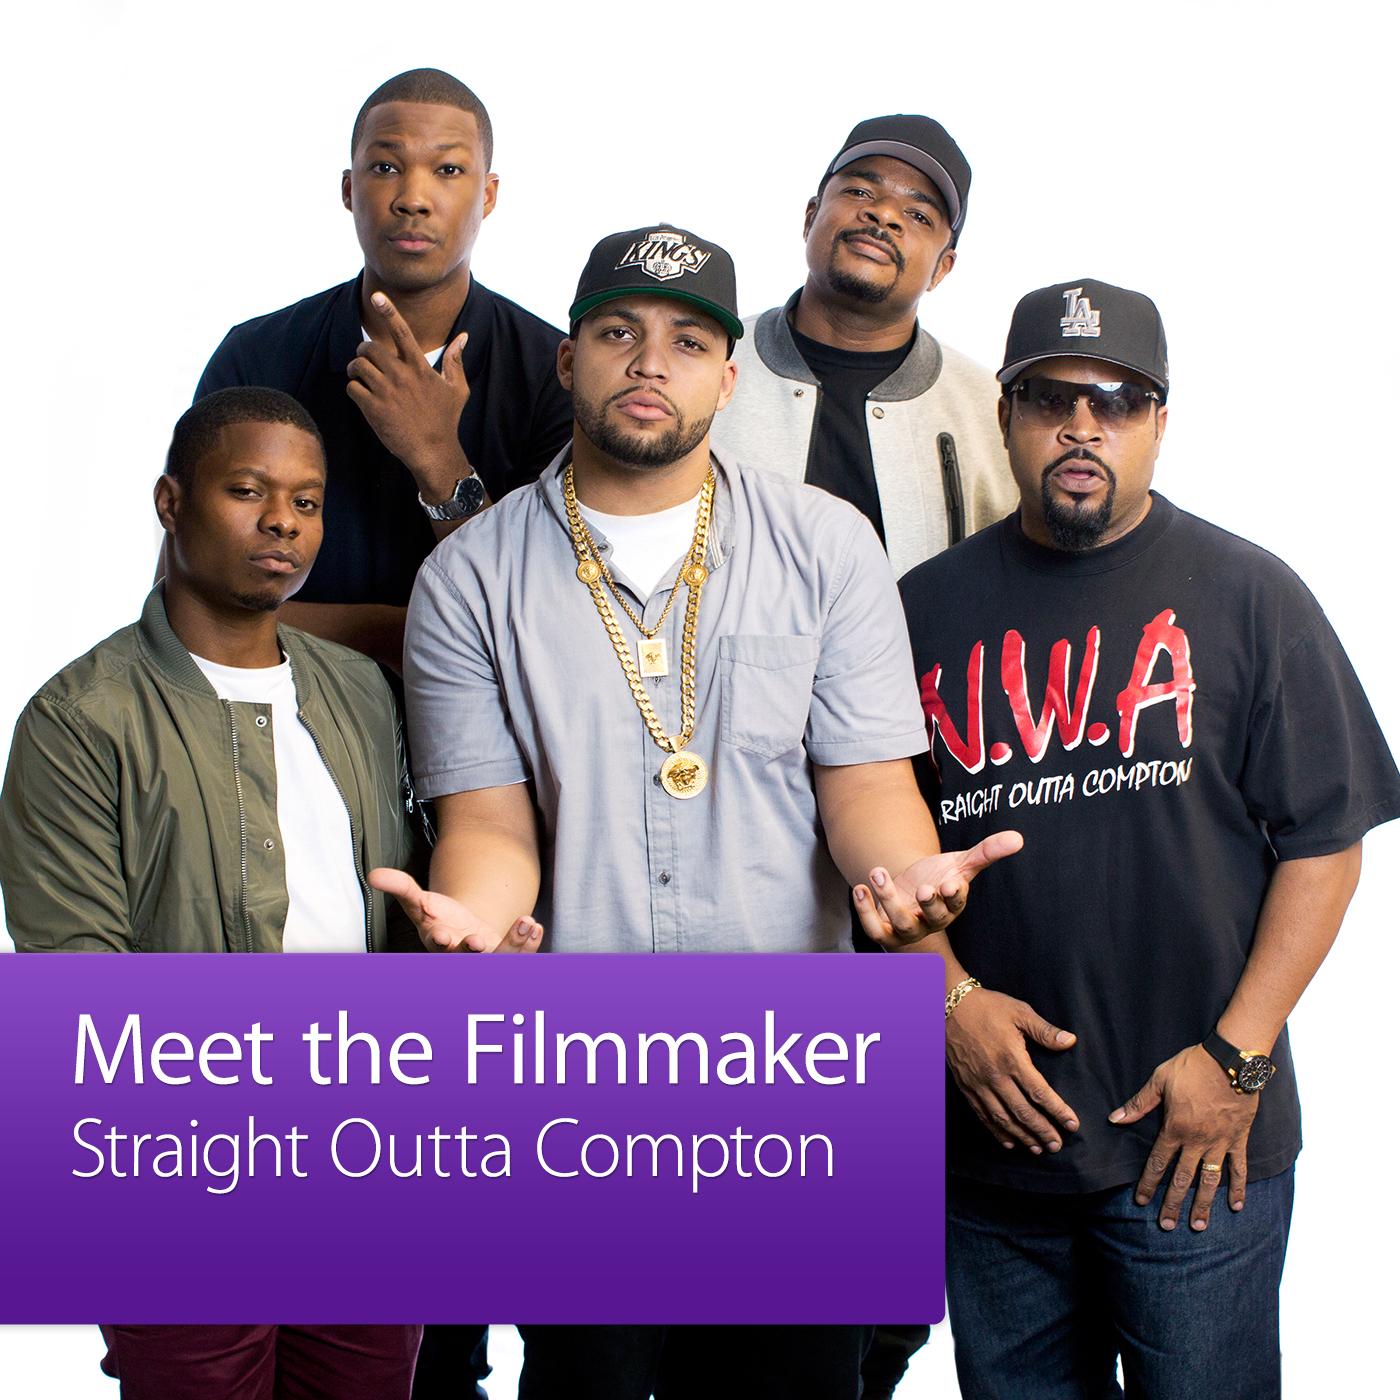 Straight Outta Compton: Meet the Filmmaker